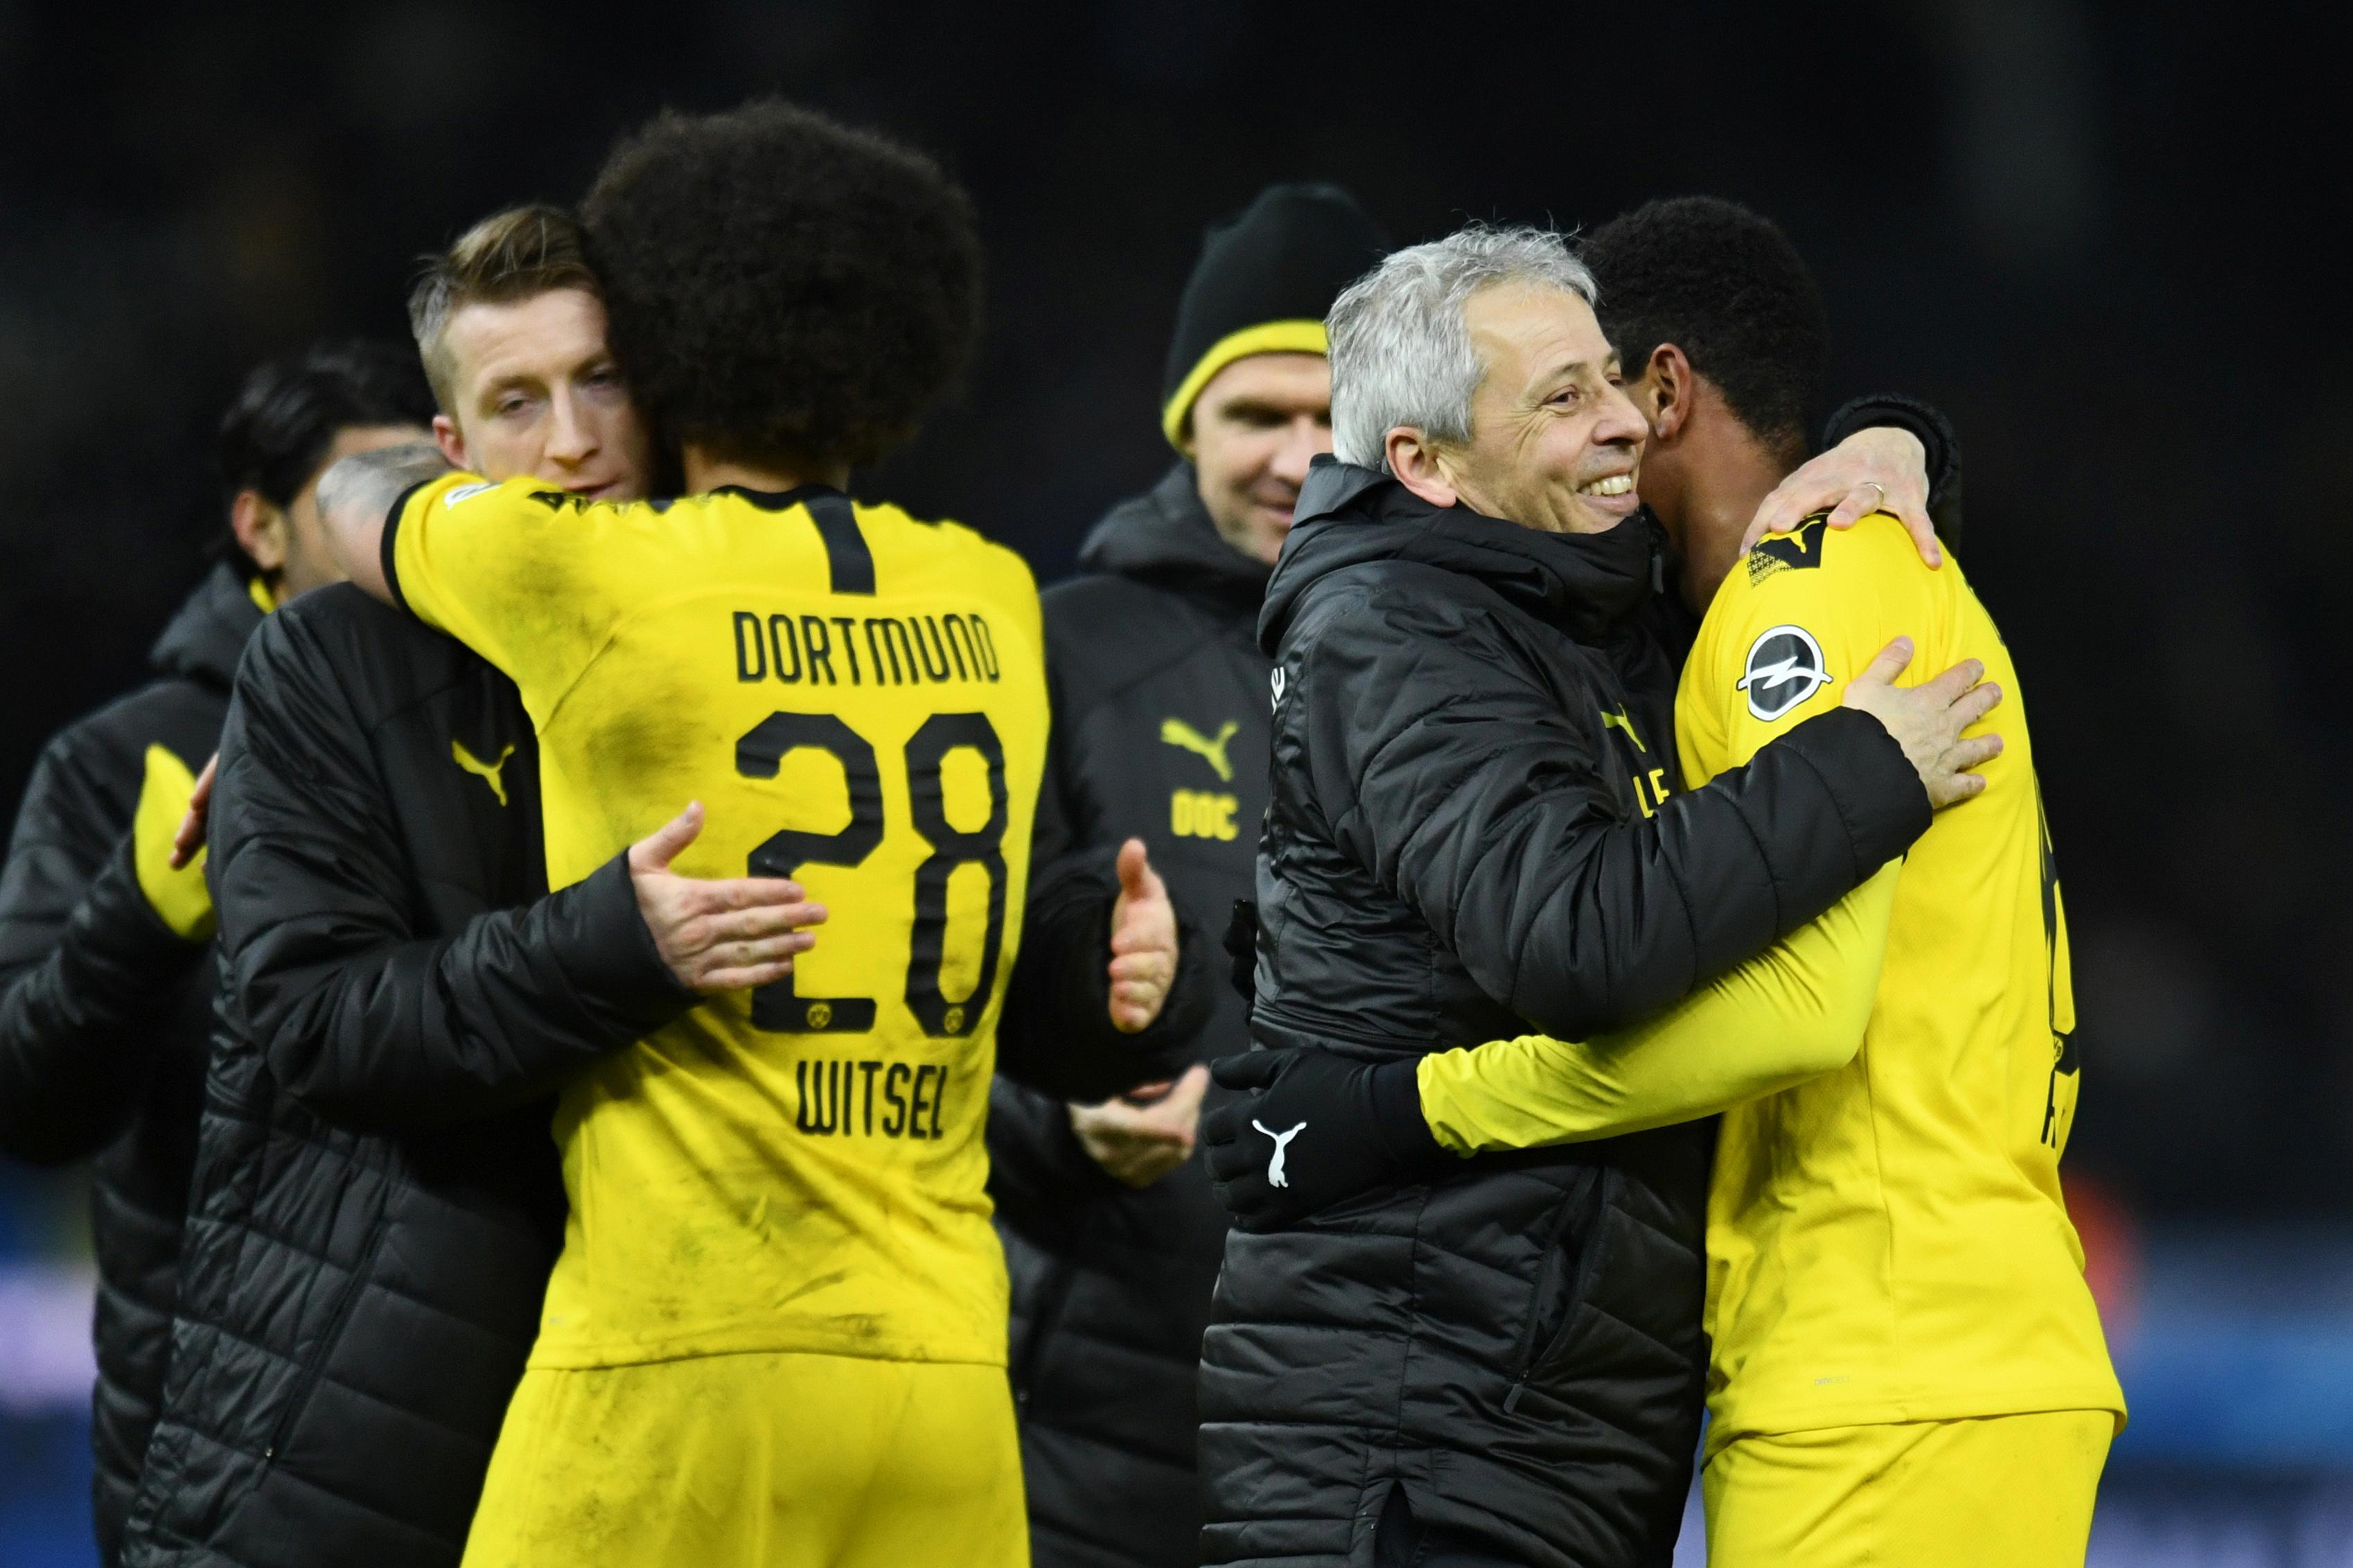 Hertha Berlin - Borussia Dortmund : Lucien Favre sauve sa peau en tremblant !